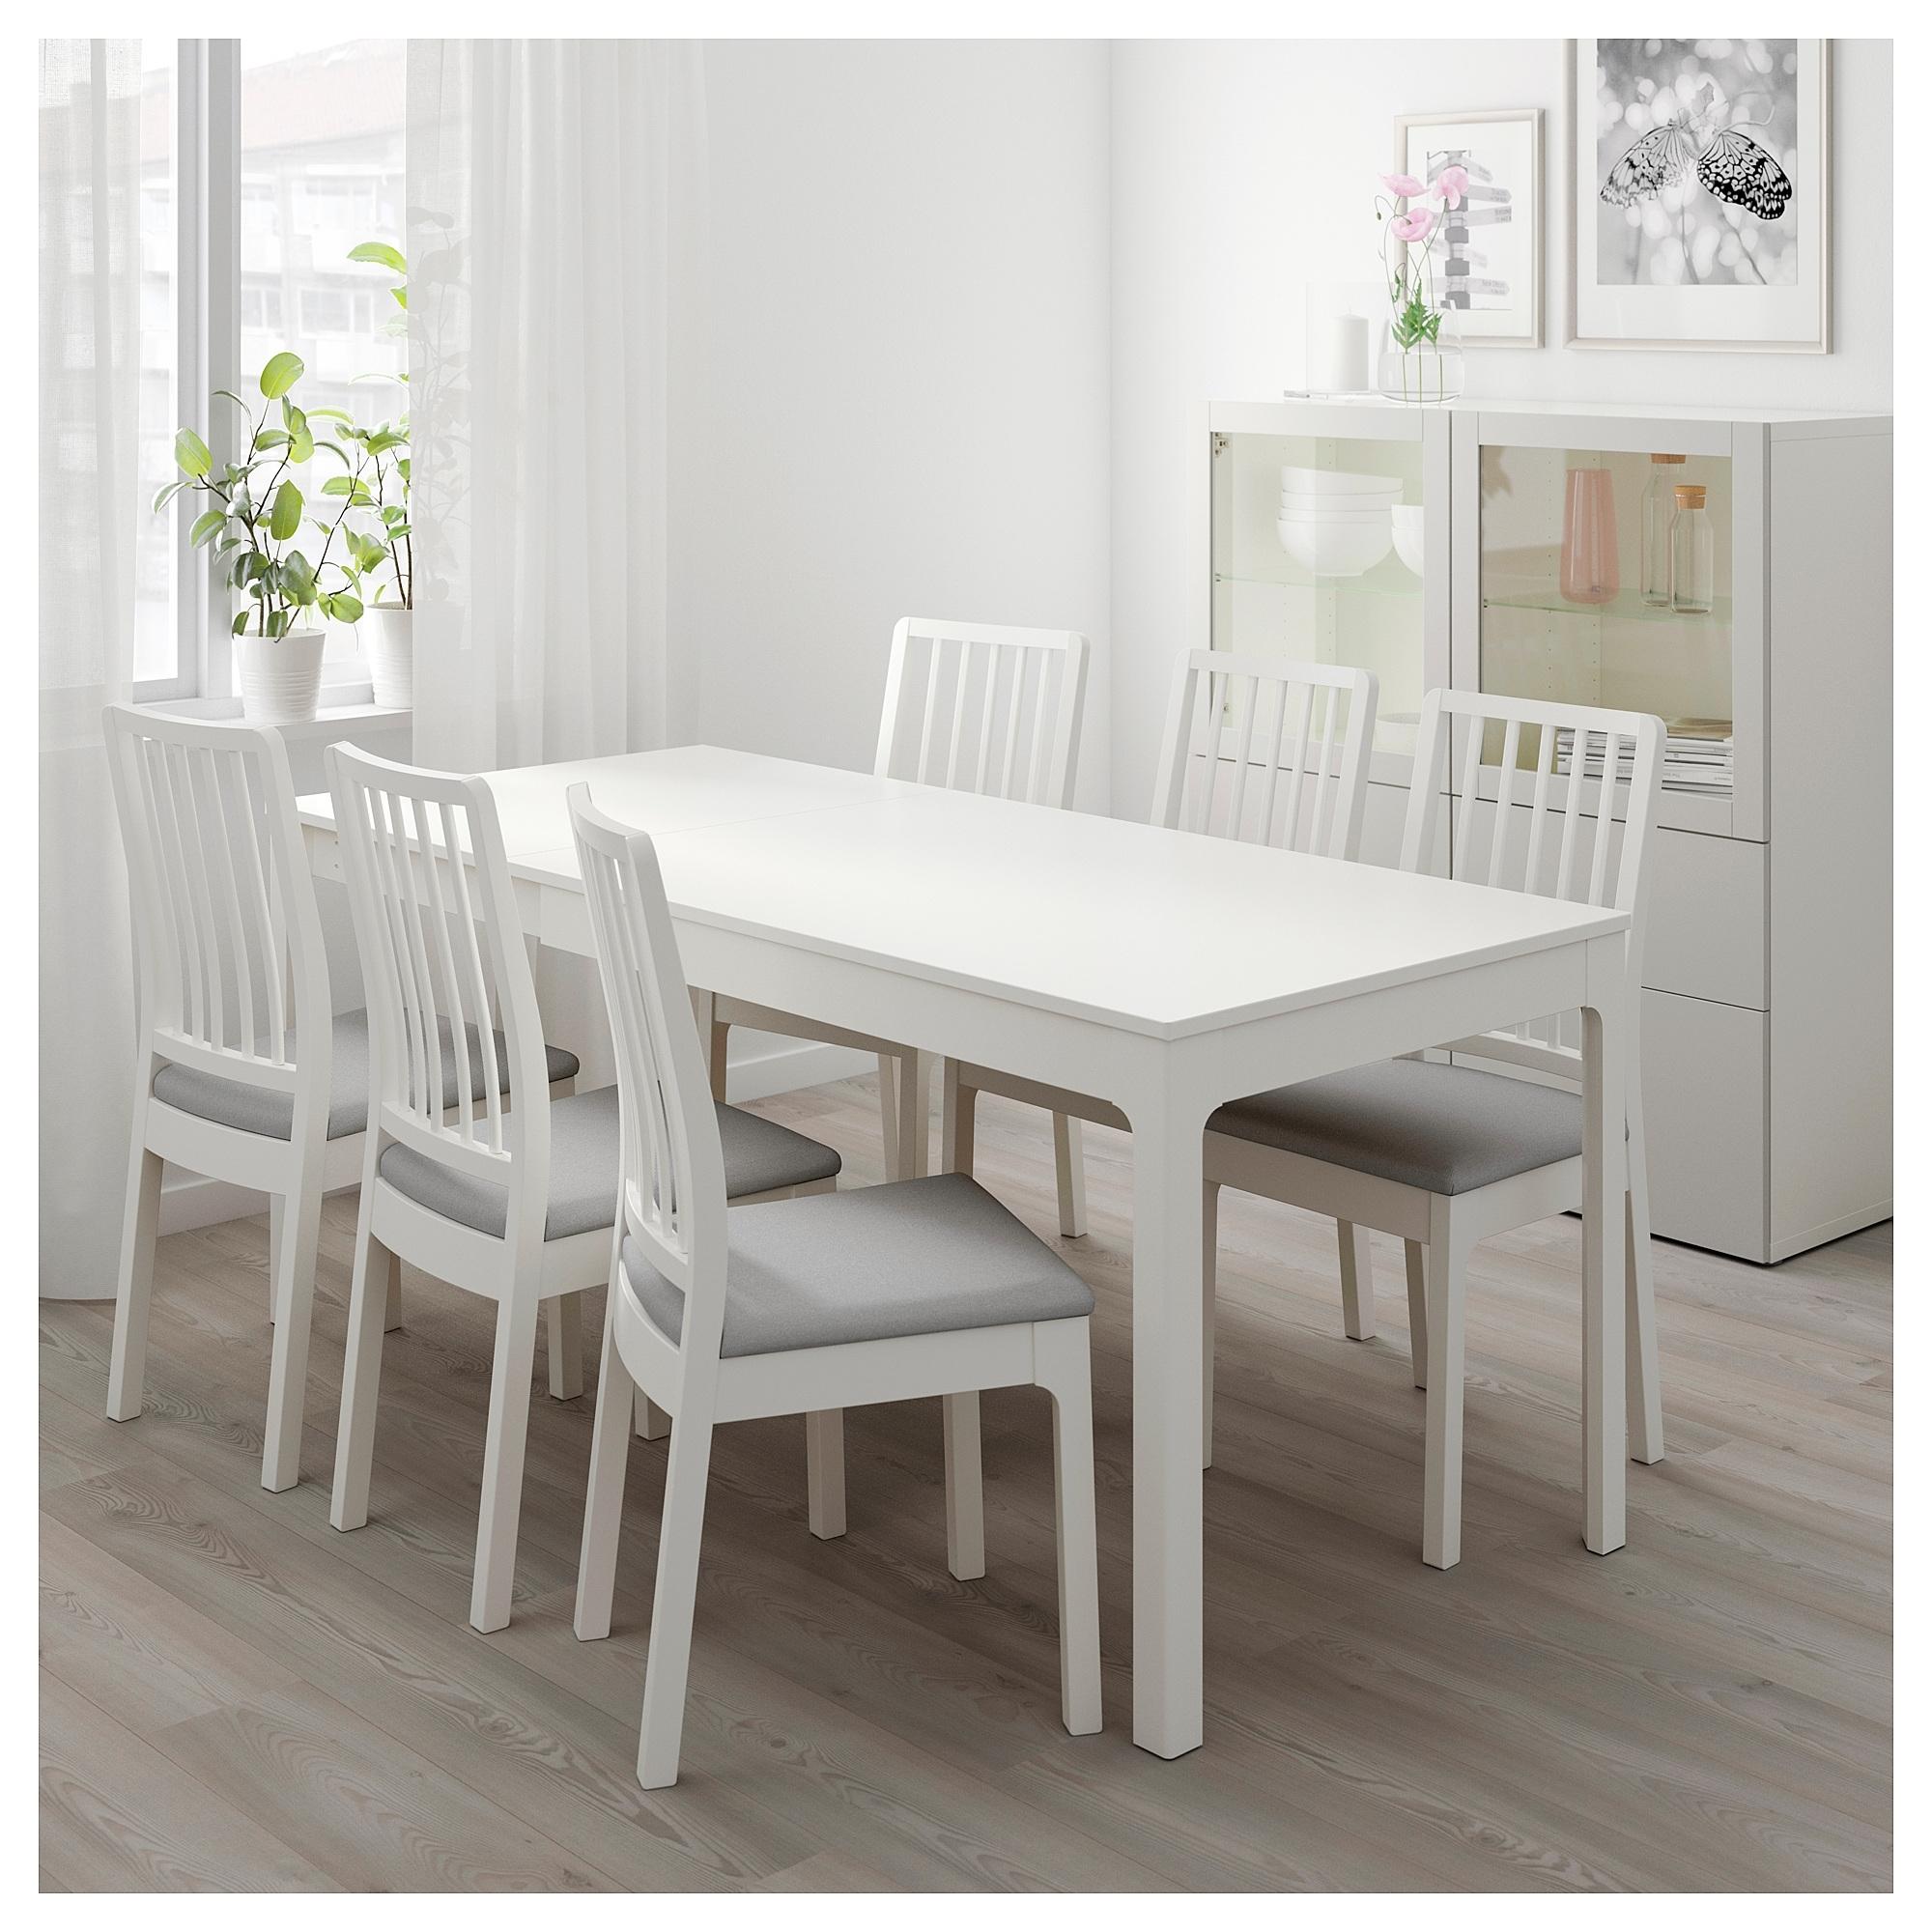 Set Tavolo E Sedie Da Cucina Ikea